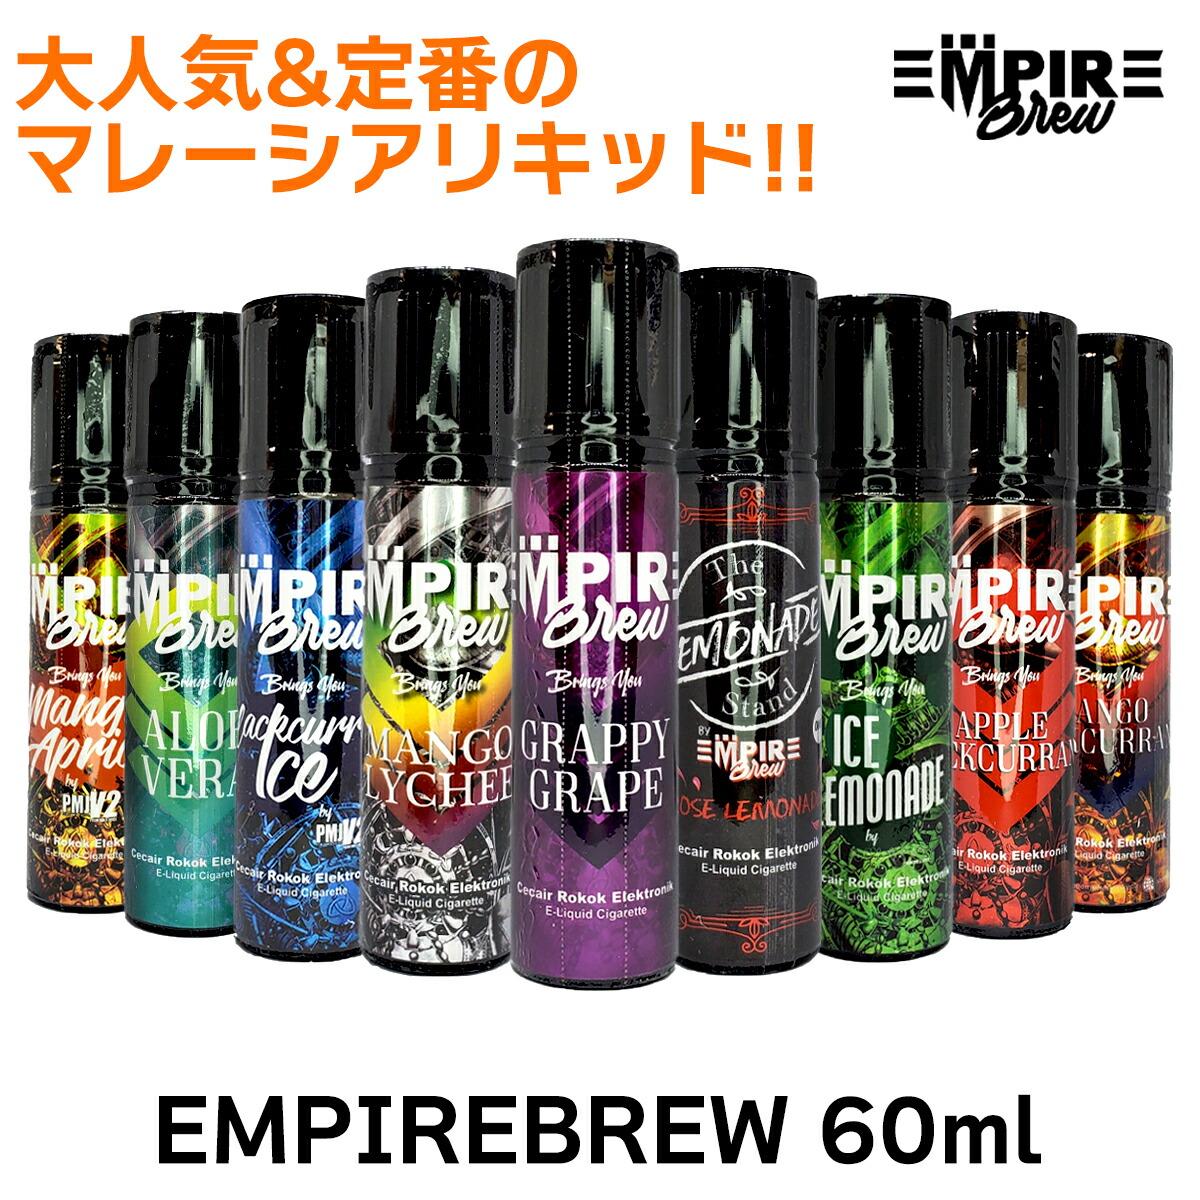 EMPIRE BREW エンパイア ブリュー 高コスパ 60ml vape リキッド  vapeリキッド フルーツ メンソール EMPIRE BREW エンパイア ブリュー